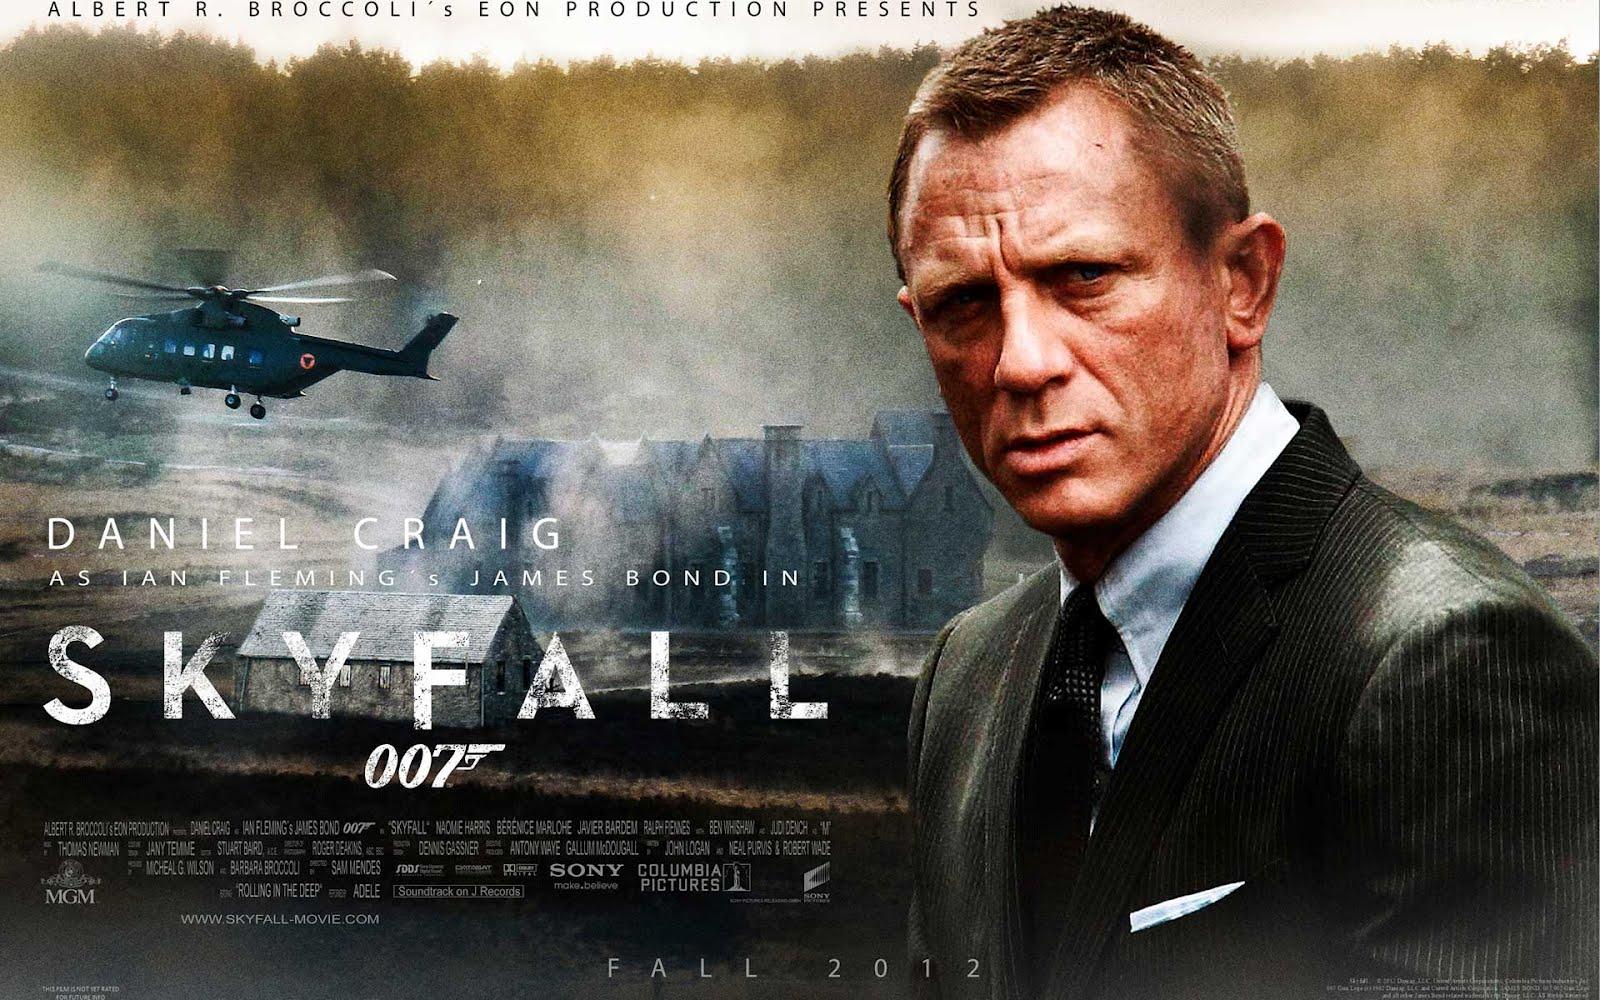 http://3.bp.blogspot.com/-Od2XTCT3oL8/UBmJ5H_v_qI/AAAAAAAAAuU/2Pzo_le158c/s1600/james_bond_skyfall_wallpaper.jpg